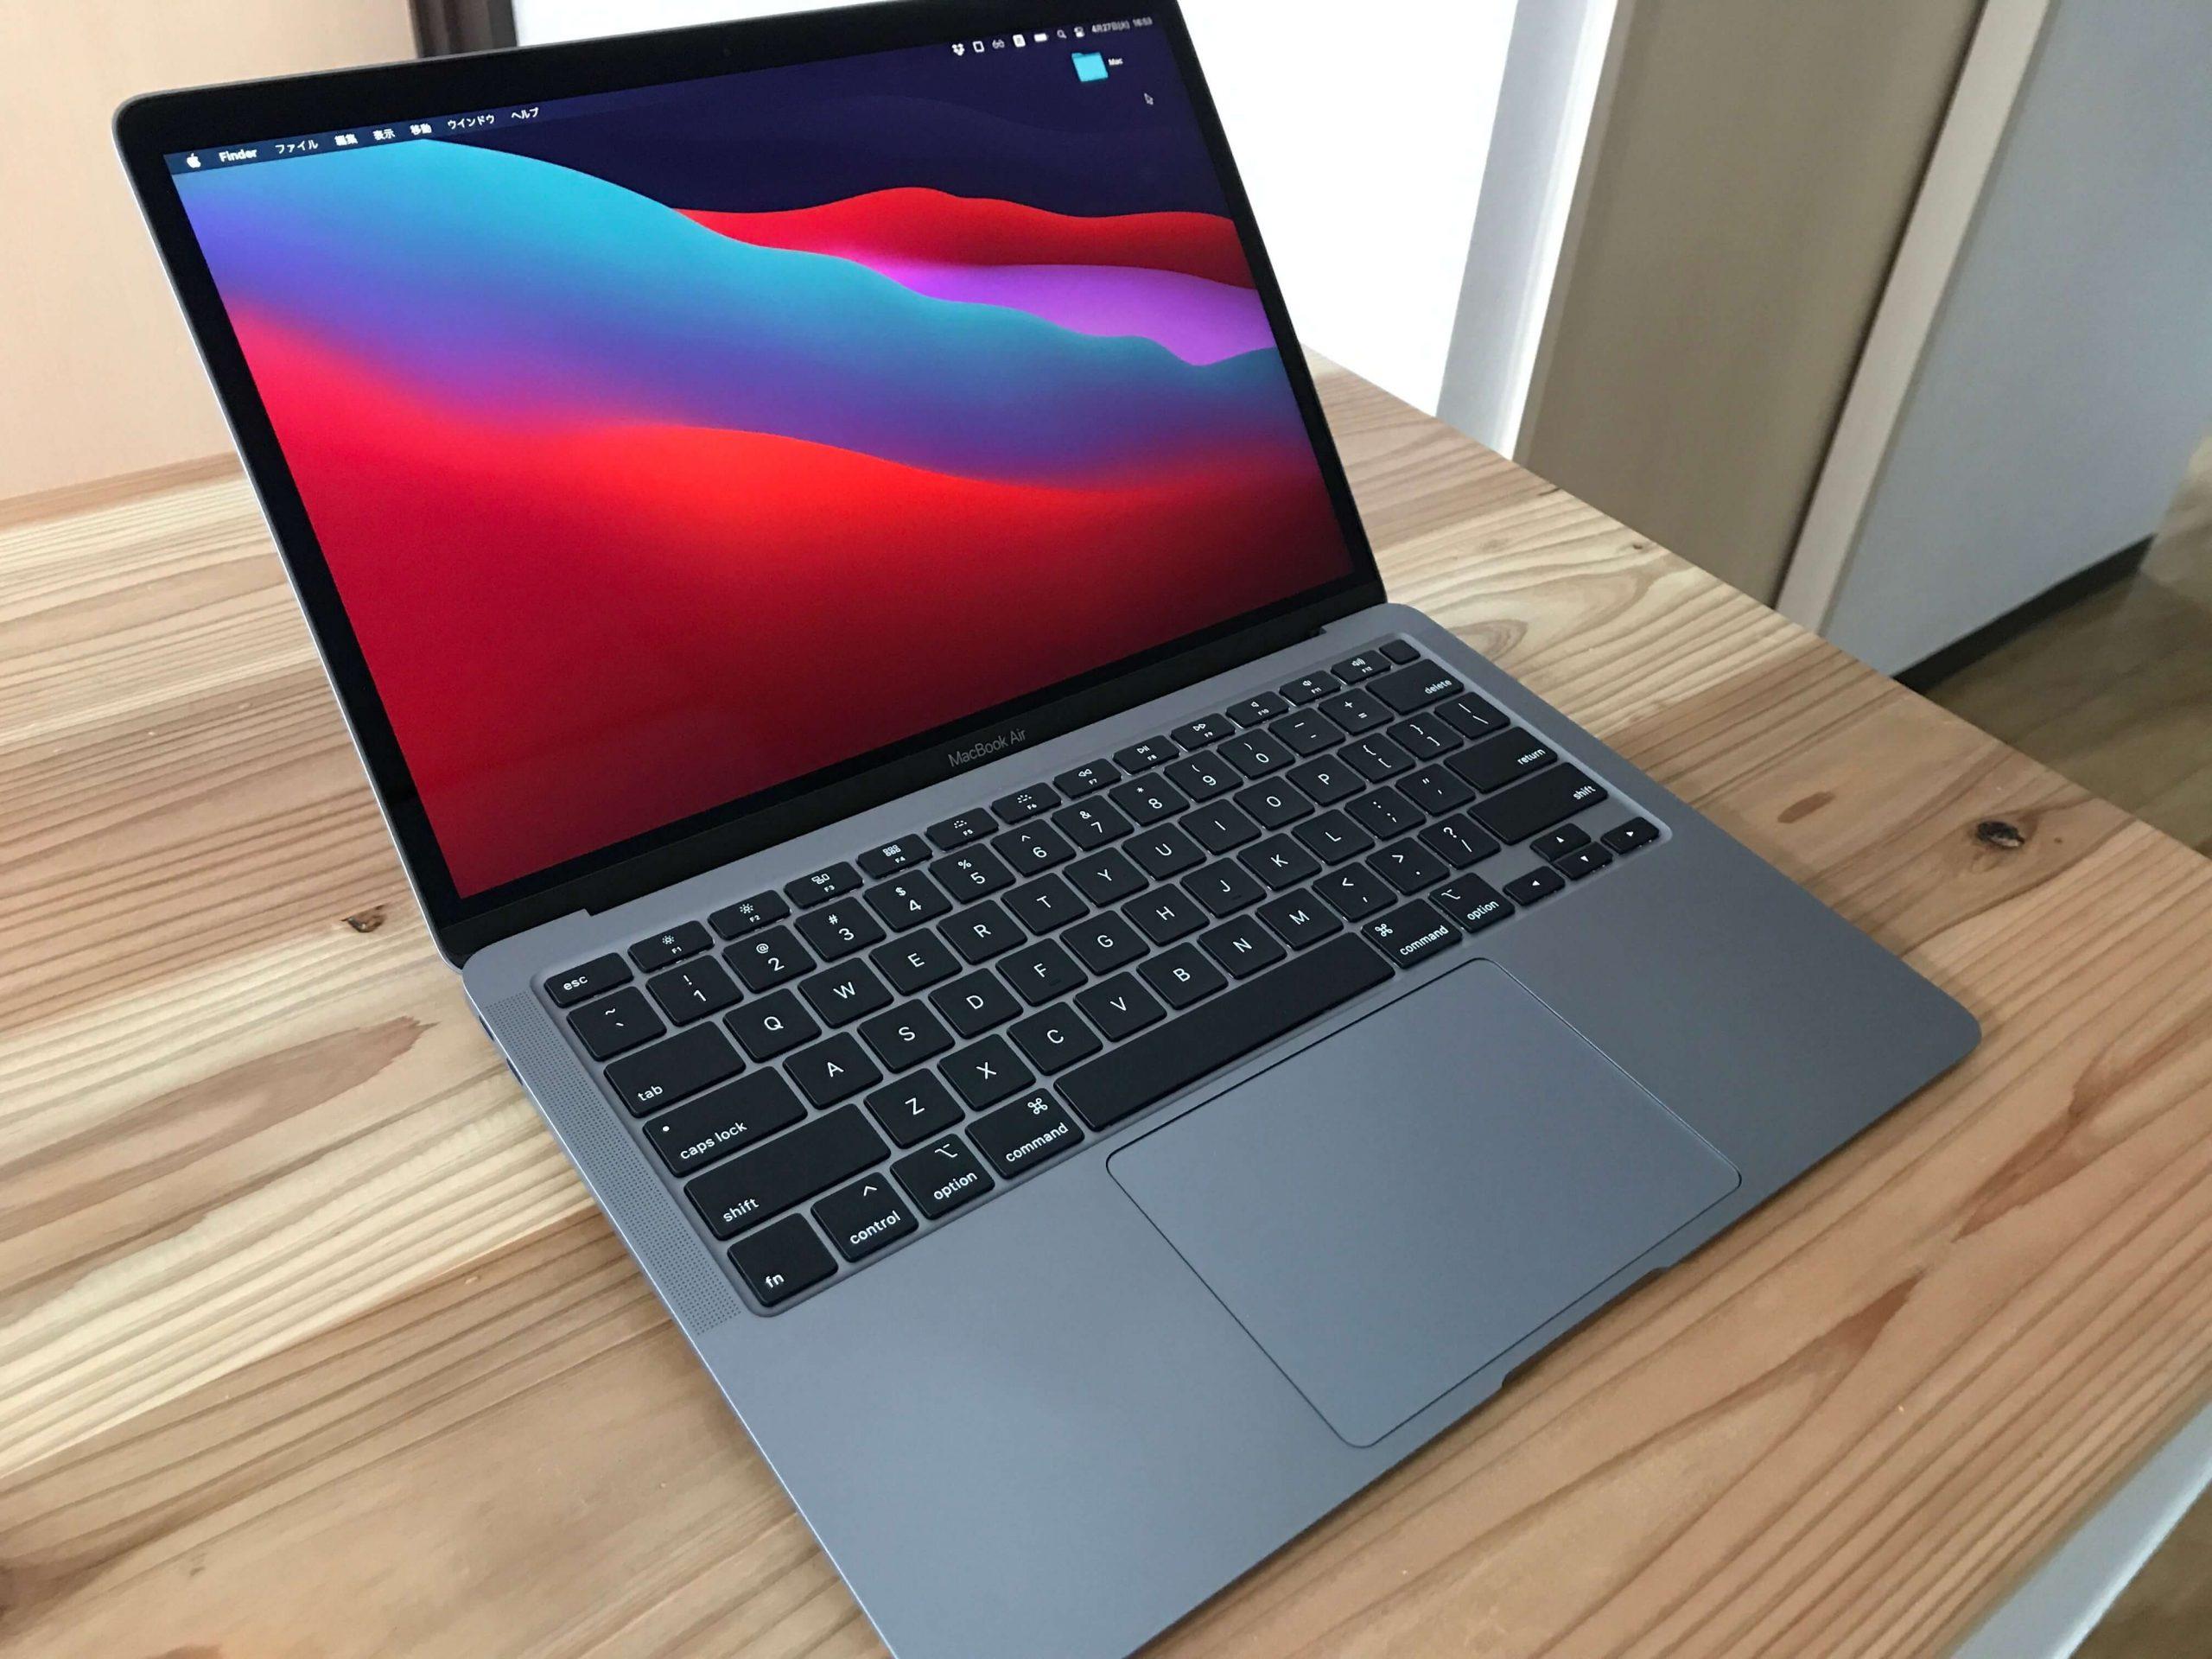 macbookを開いたところ